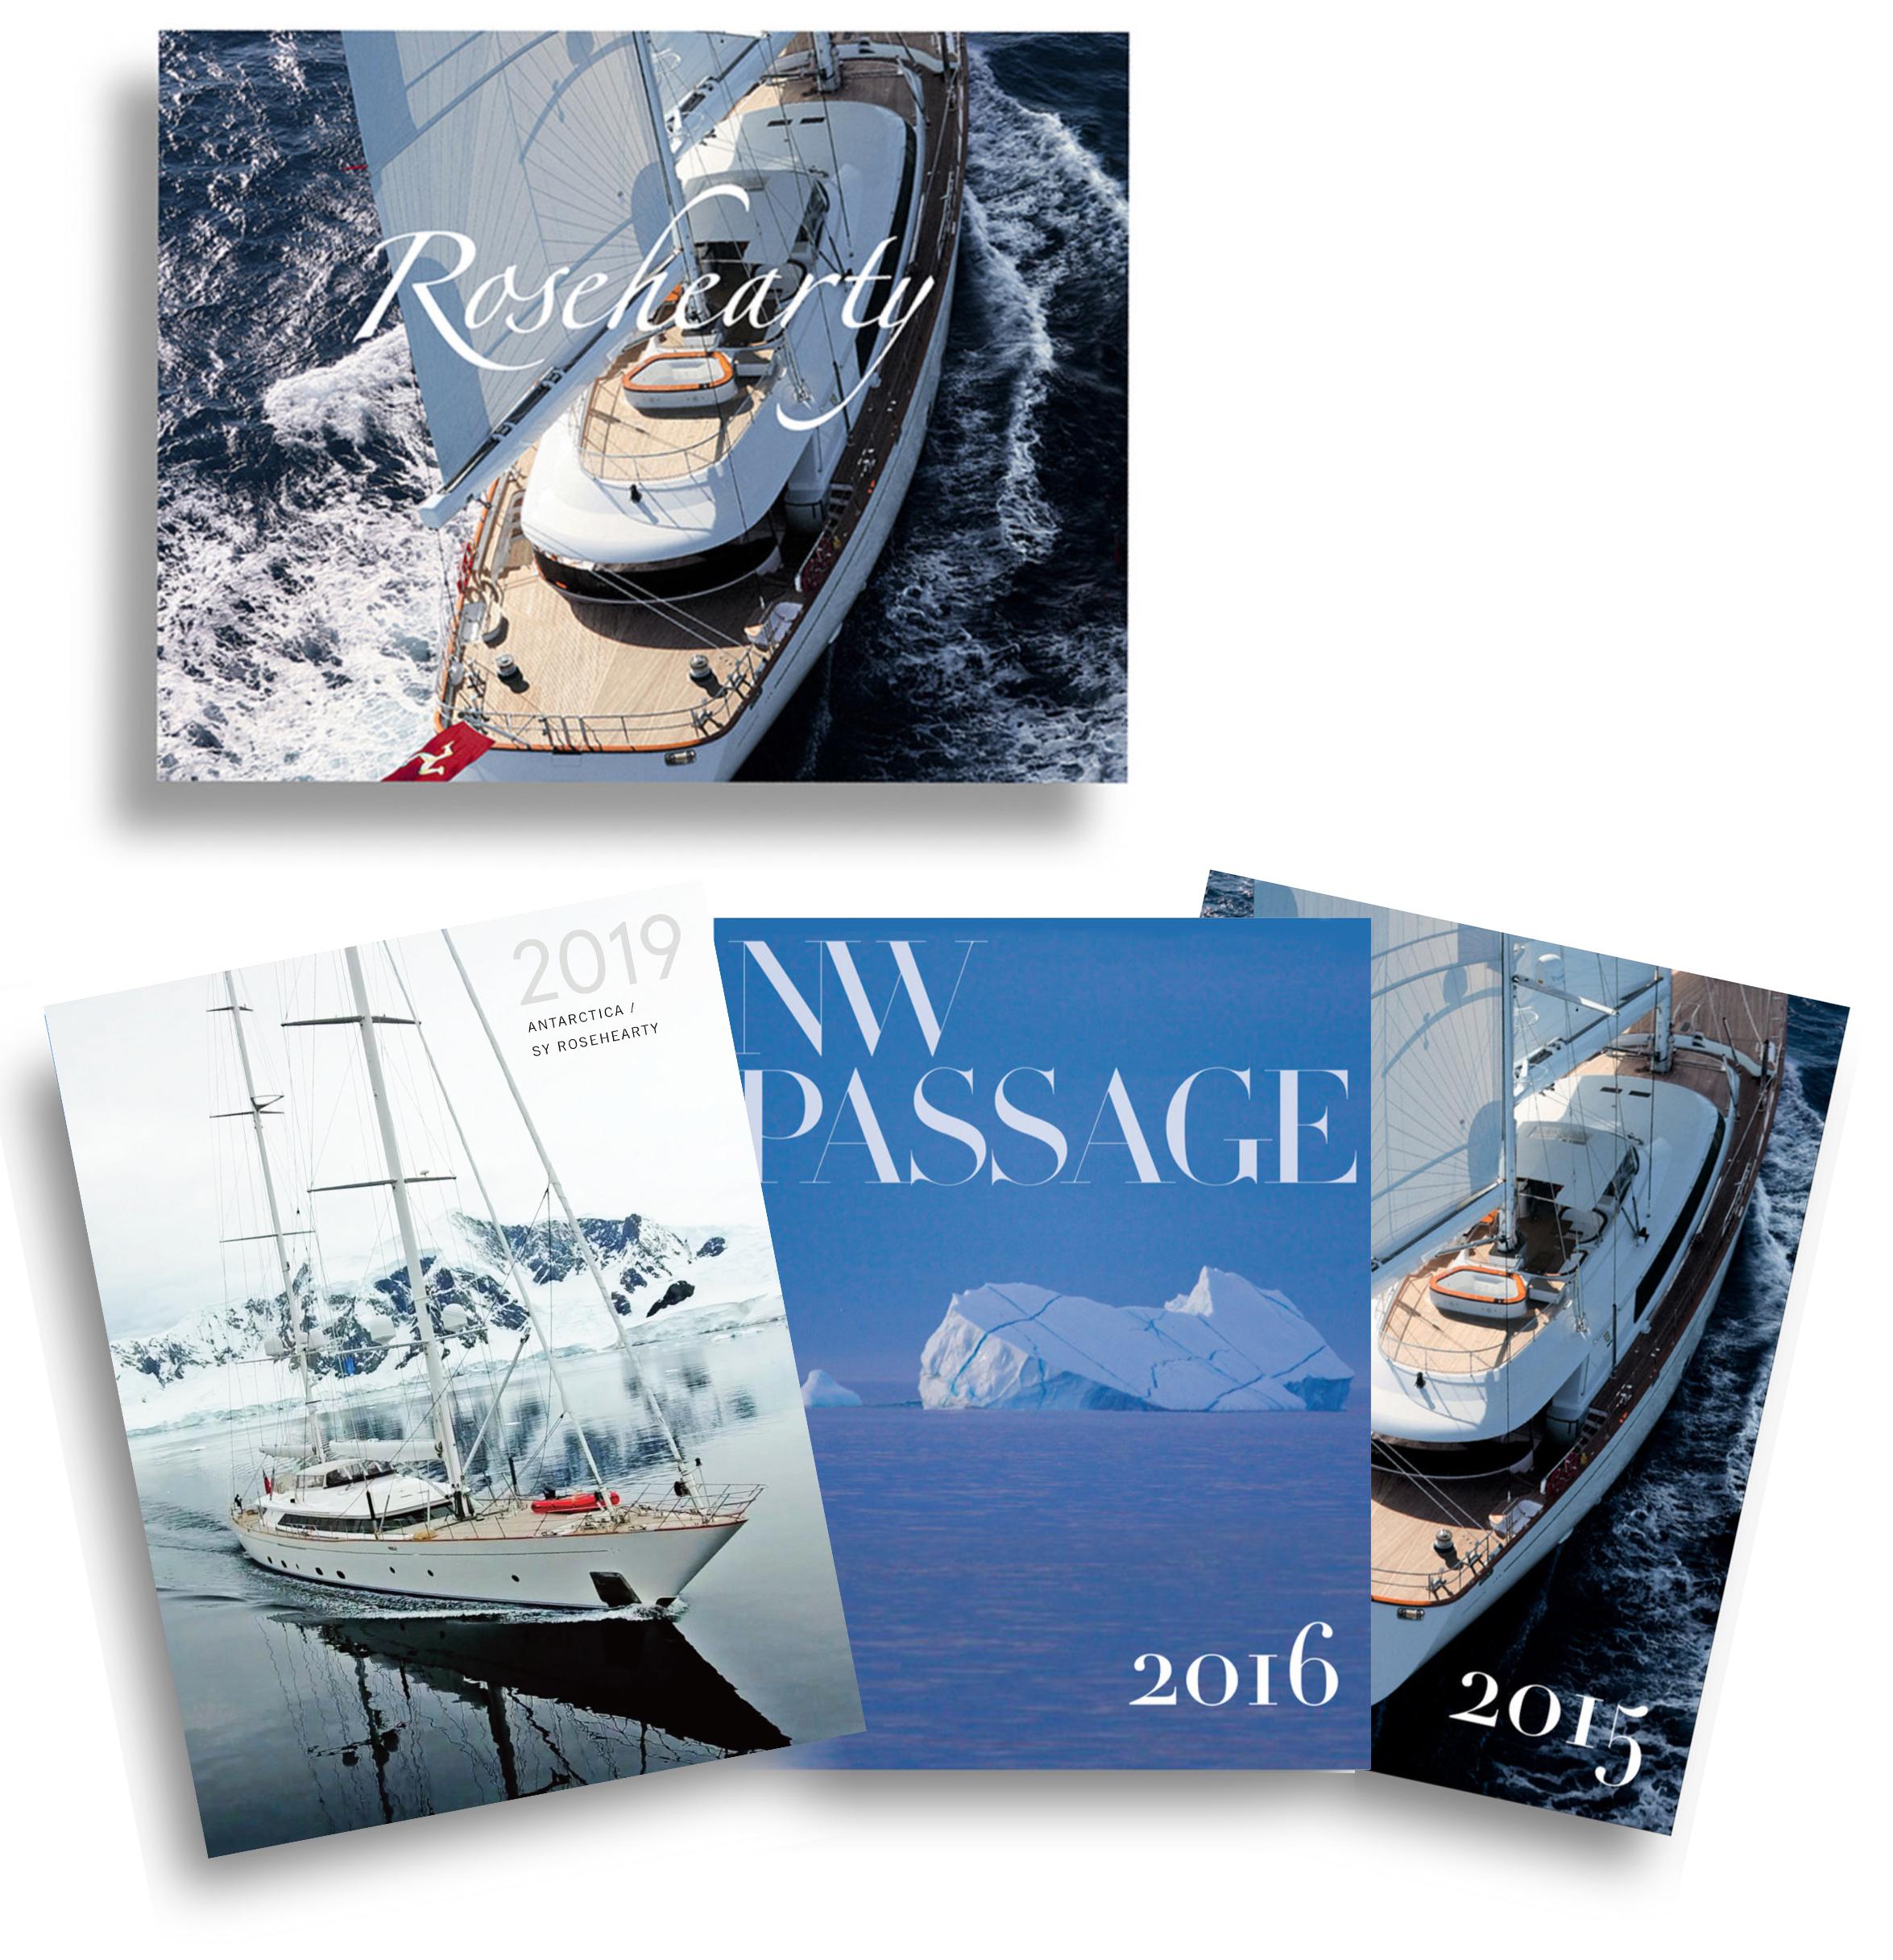 roseheart magazines.jpg